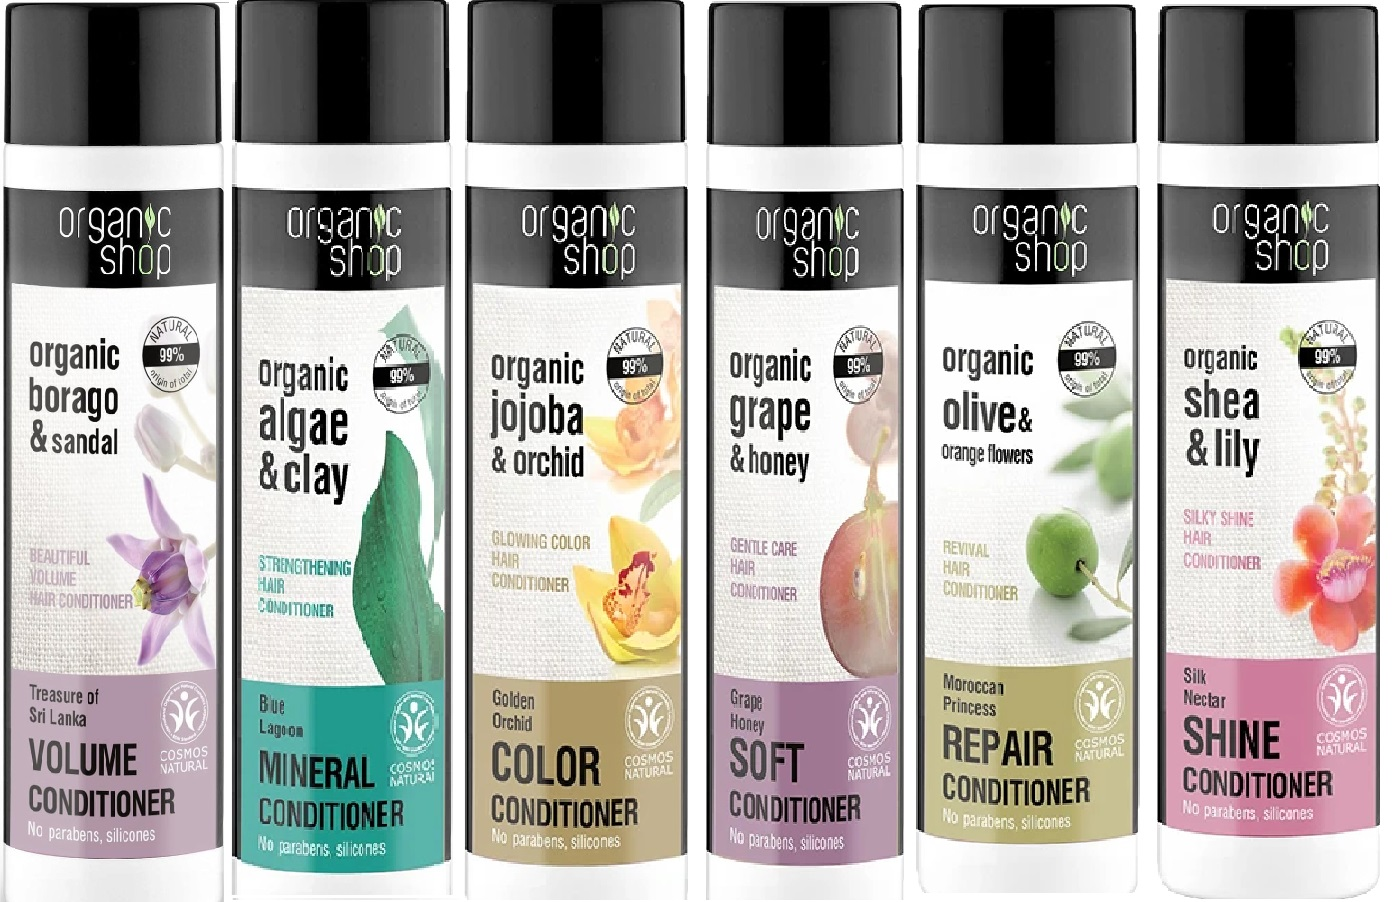 organic-shop-volume-conditioner-treasure-of-sri-lanka-280-ml